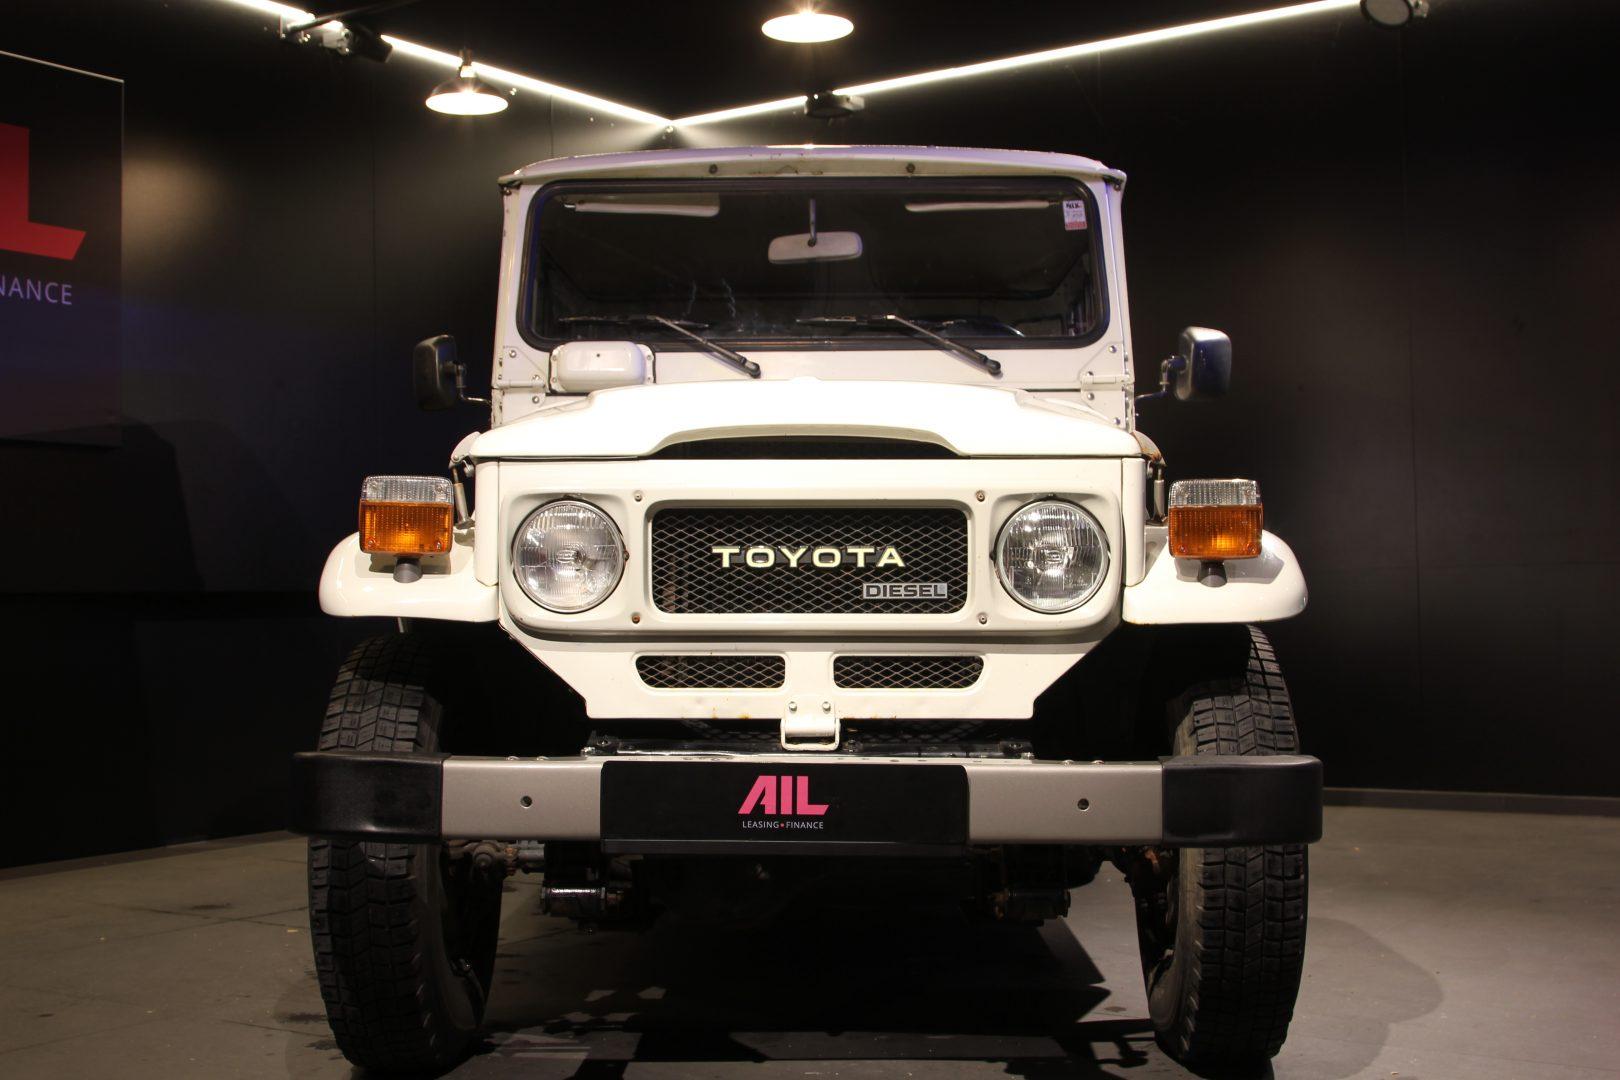 AIL Toyota Landcruiser  10